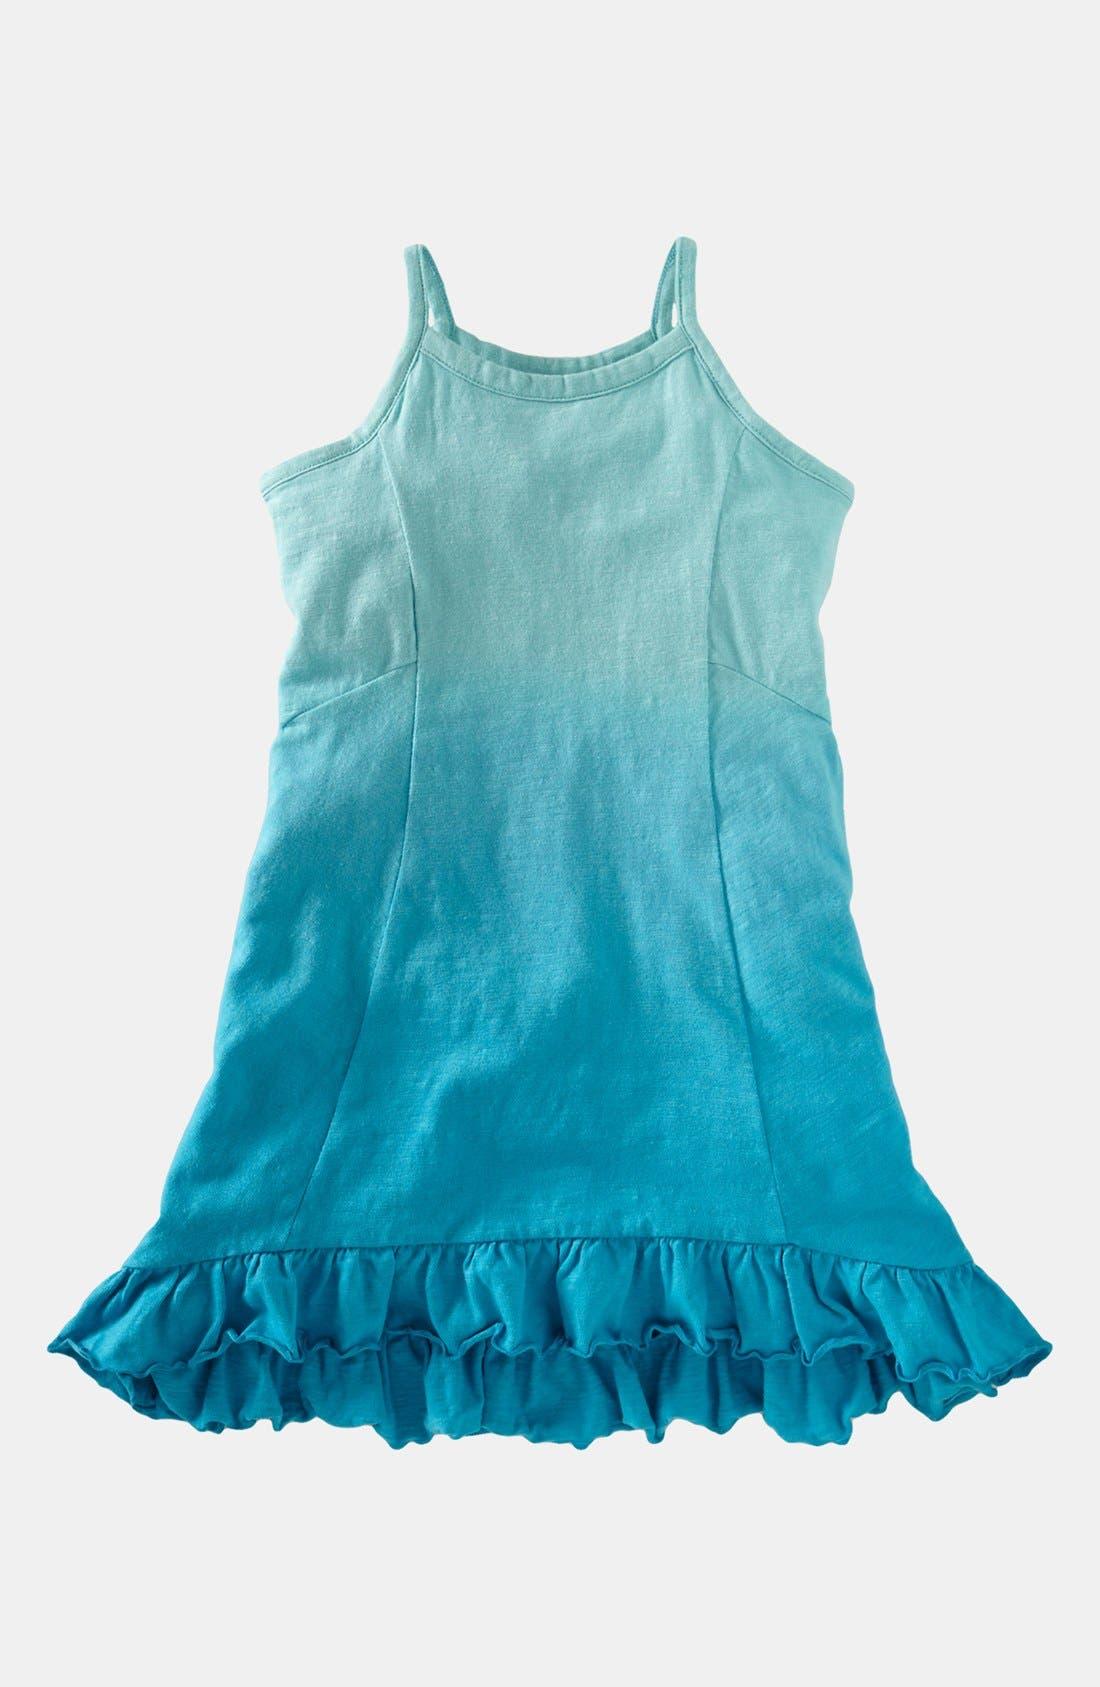 Alternate Image 1 Selected - Tea Collection 'Seafarer' Dress (Toddler)